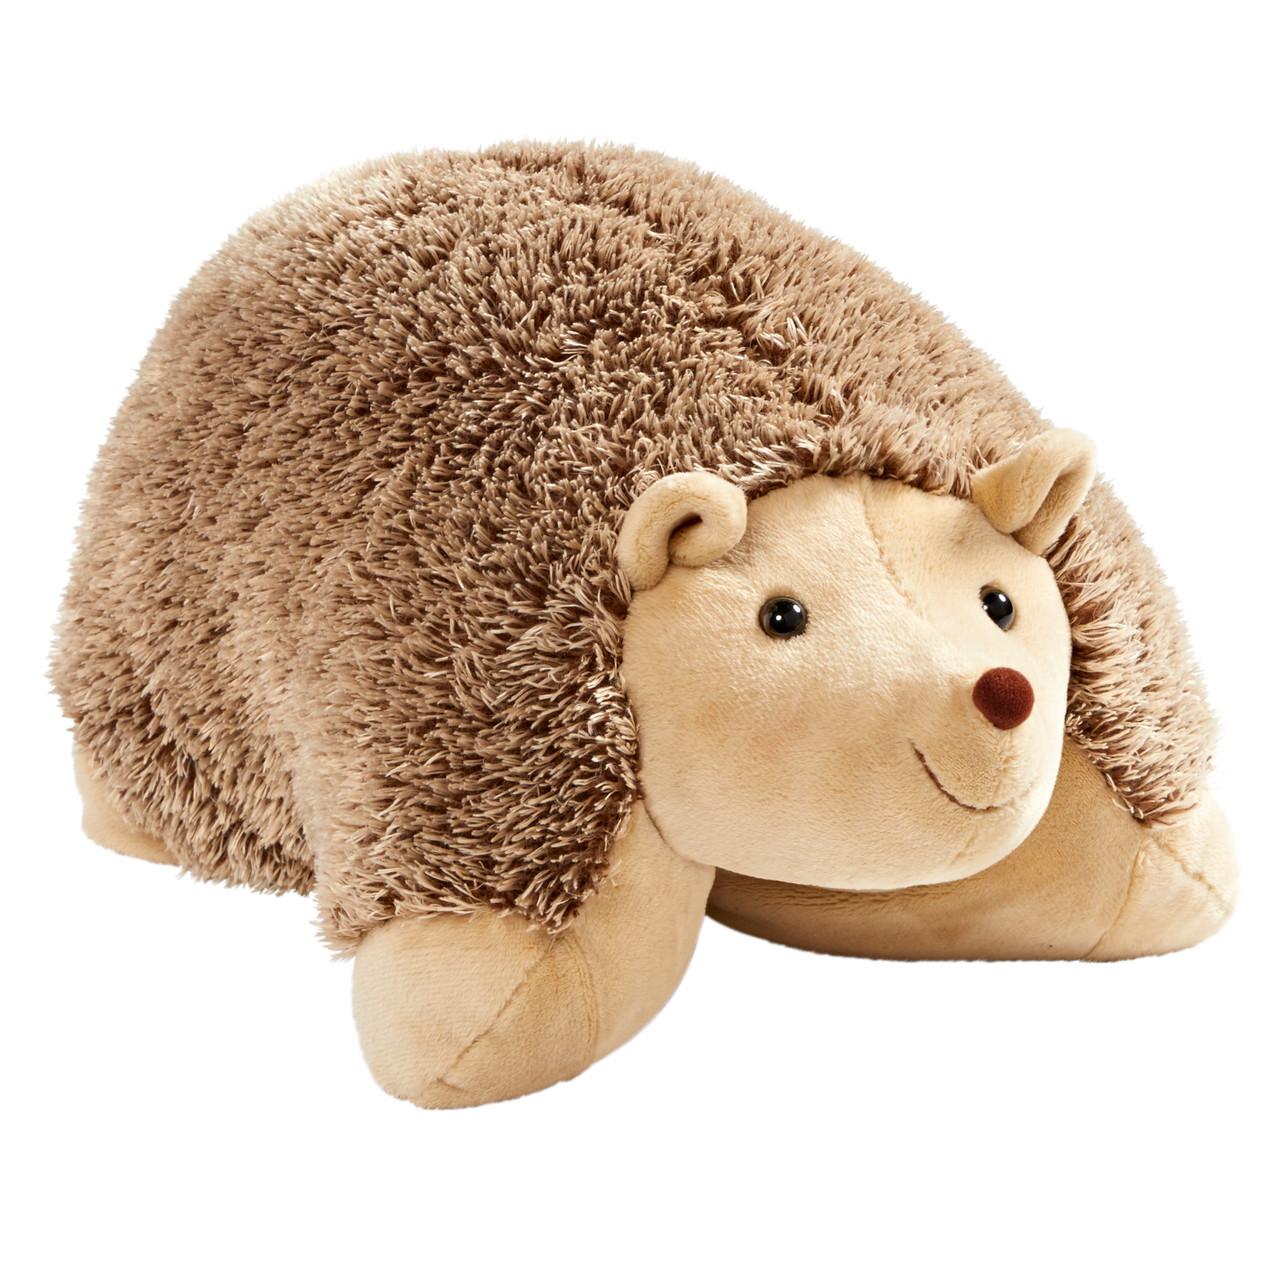 harley hedgehog pillow pet